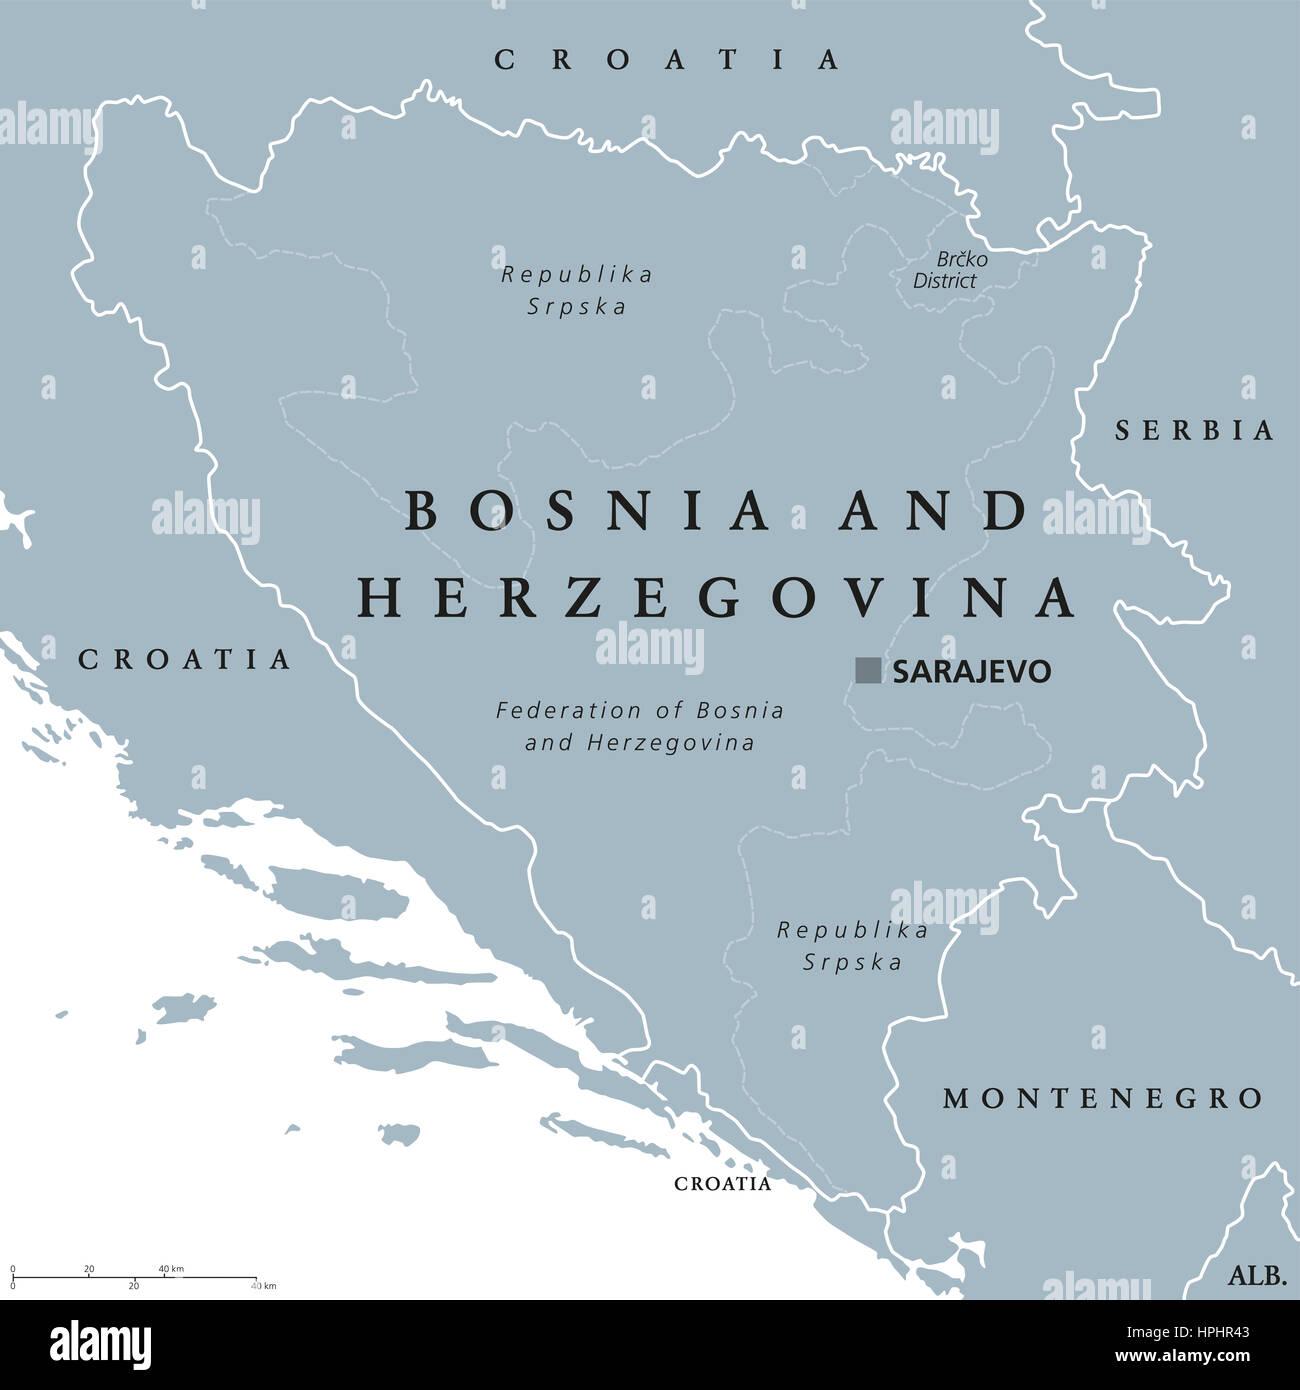 bosnia herzegovina map stockfotos bosnia herzegovina map bilder alamy. Black Bedroom Furniture Sets. Home Design Ideas